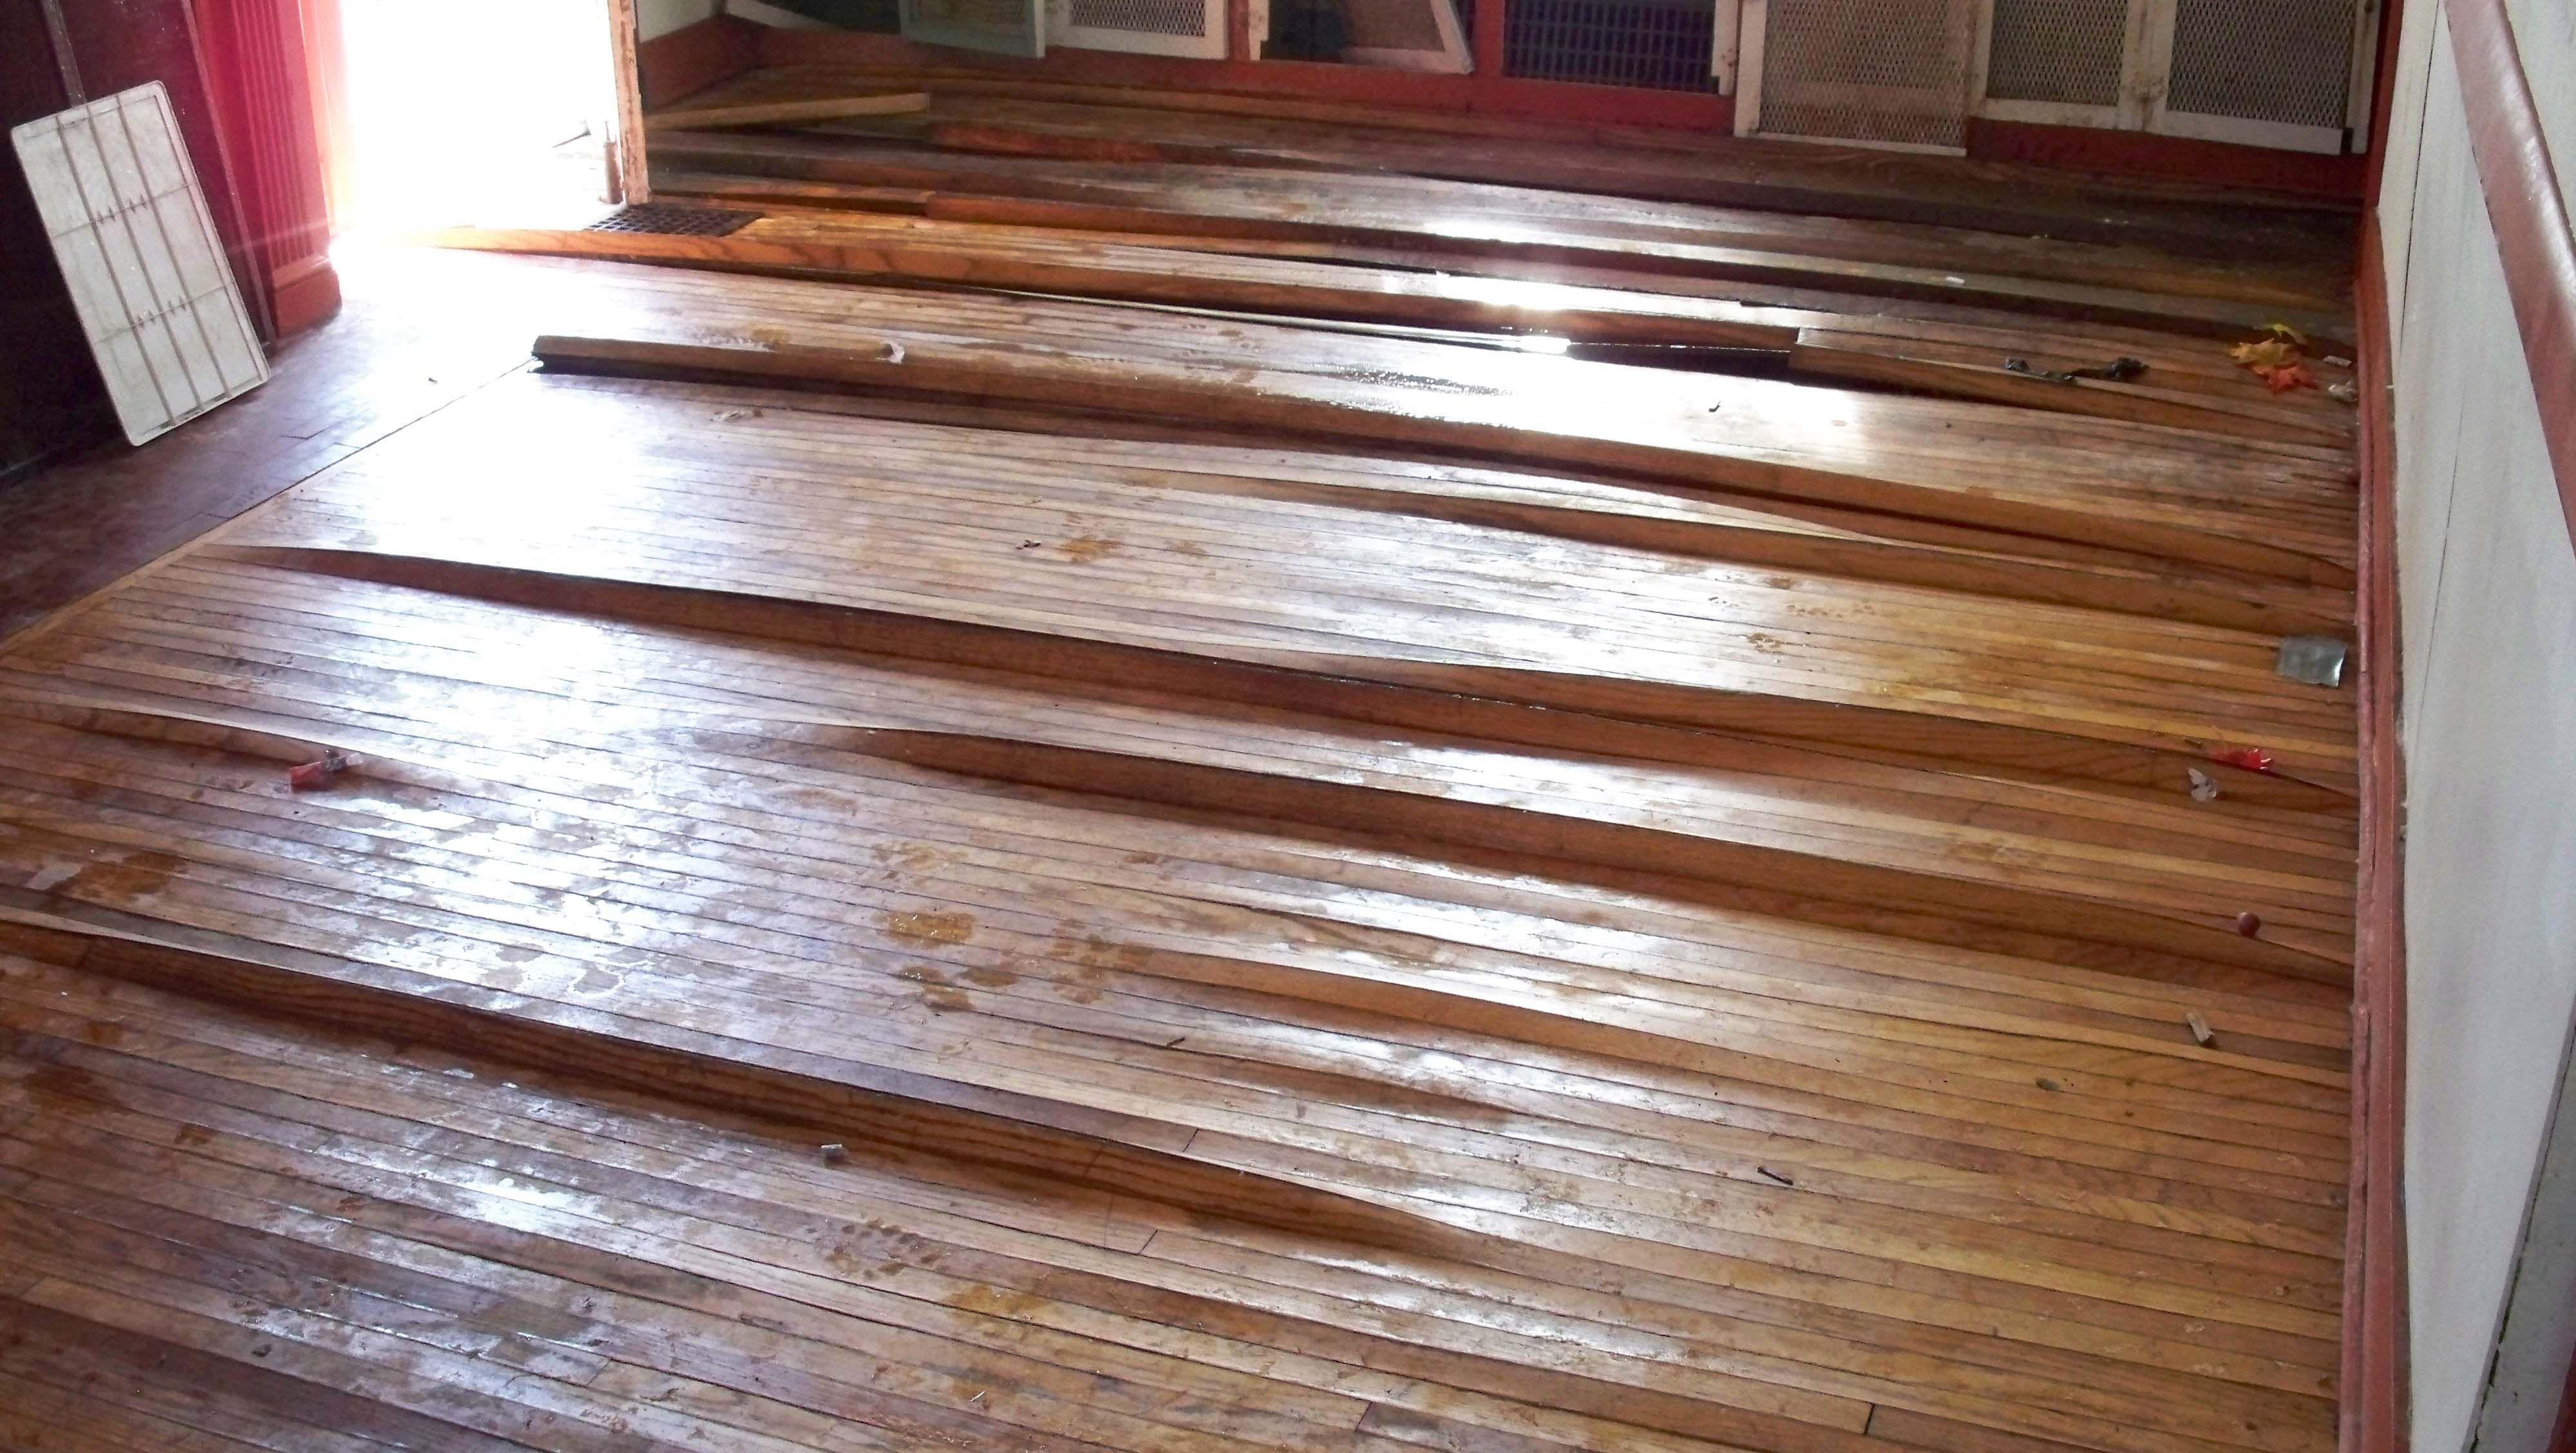 how to sand hardwood floors of sanding hardwood floors floor plan ideas inside sanding hardwood floors hardwood floor water damage warping hardwood floors